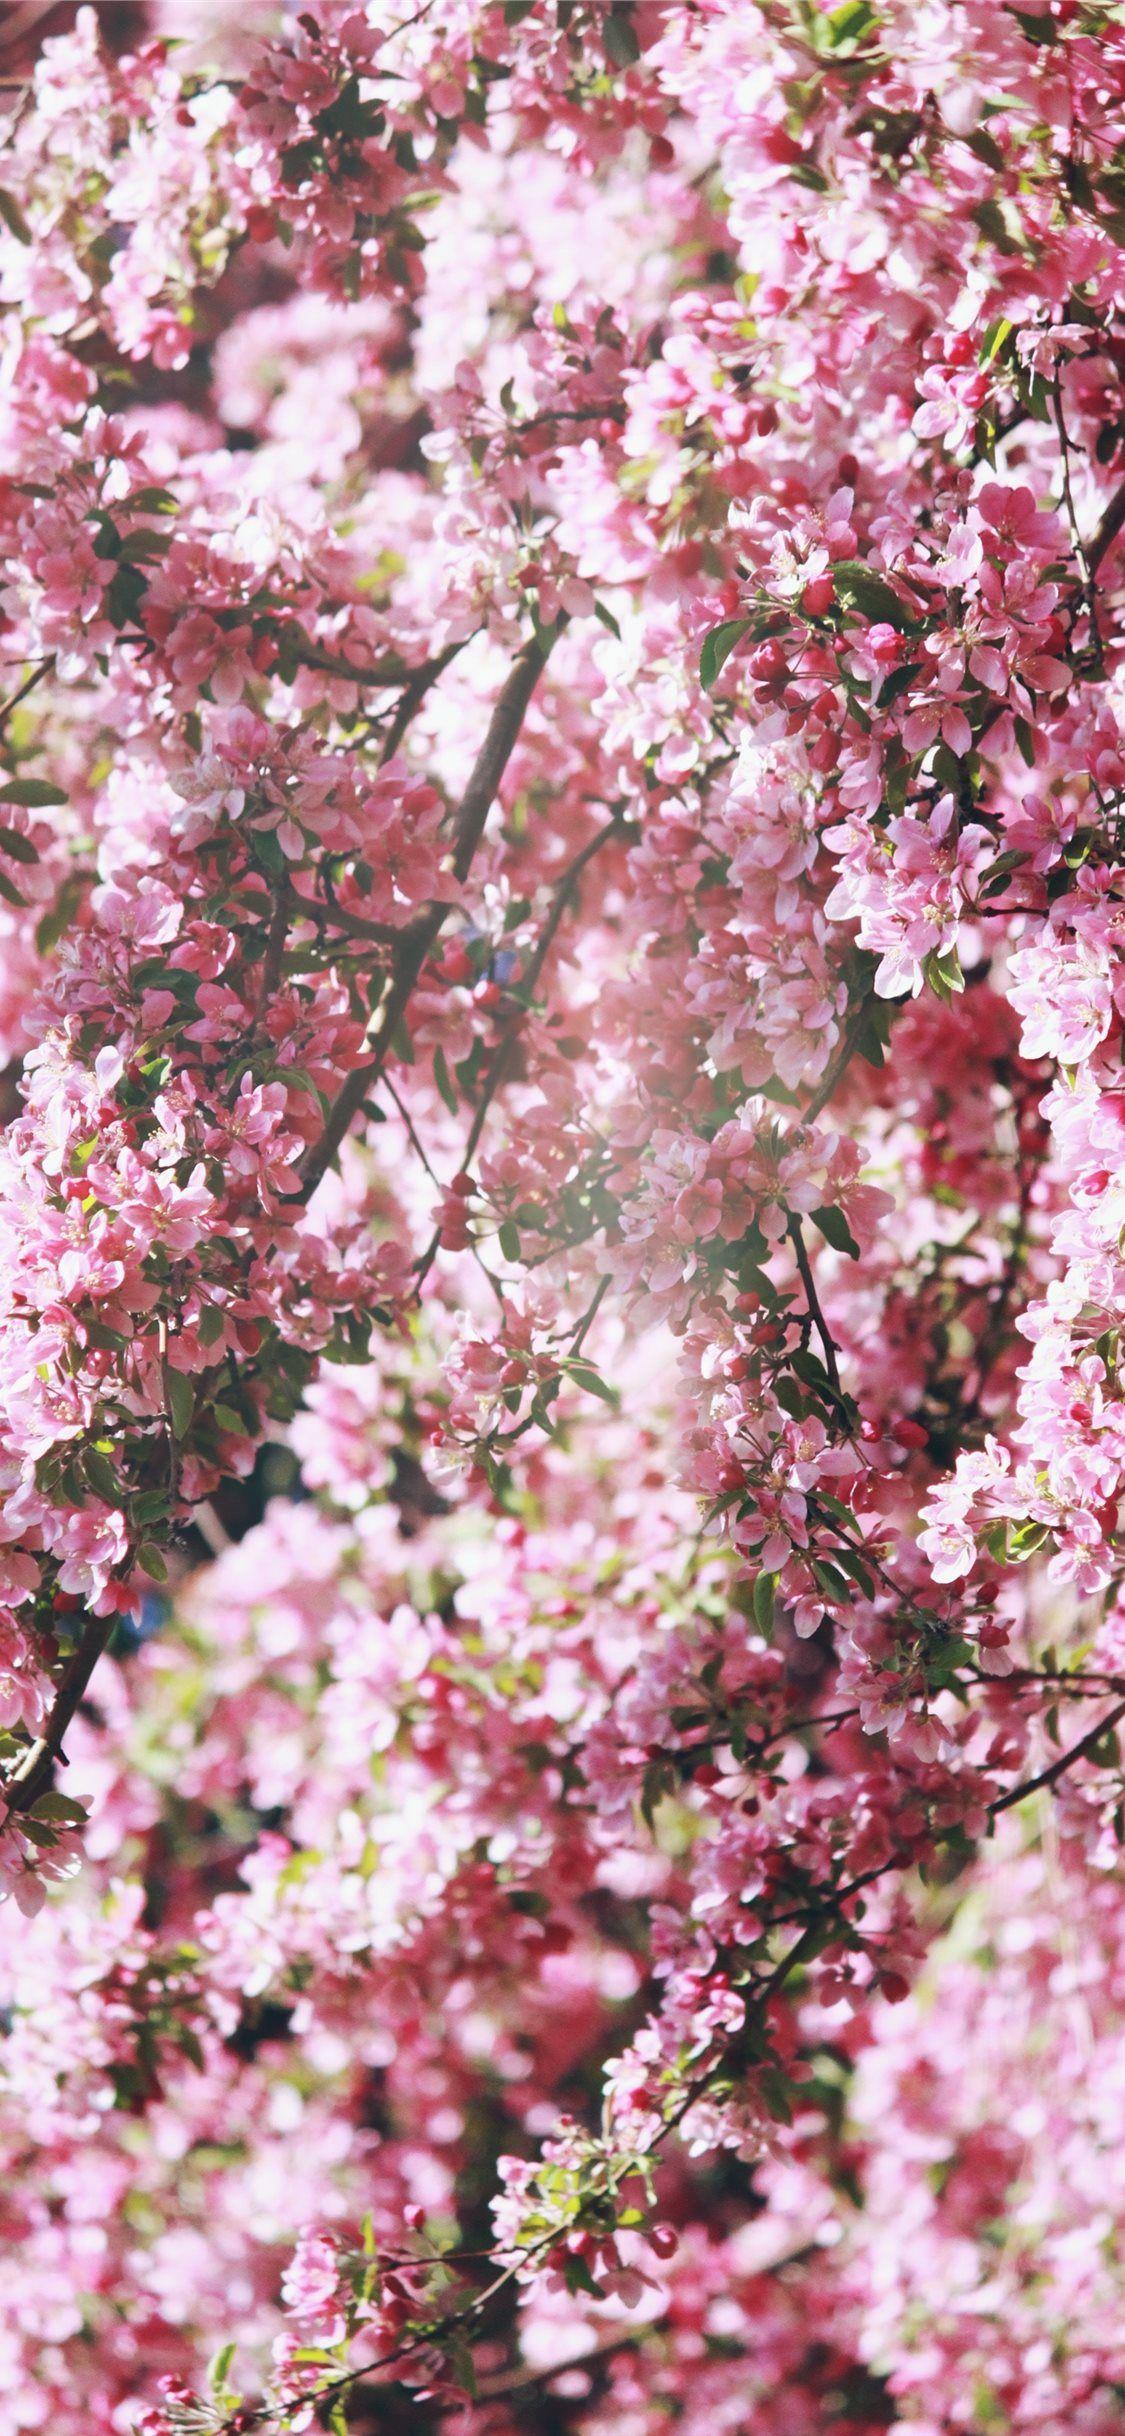 Pink Flowers Wallpaper Pink Wallpaper Nature Spring Flowers Wallpaper Pink Flowers Wallpaper